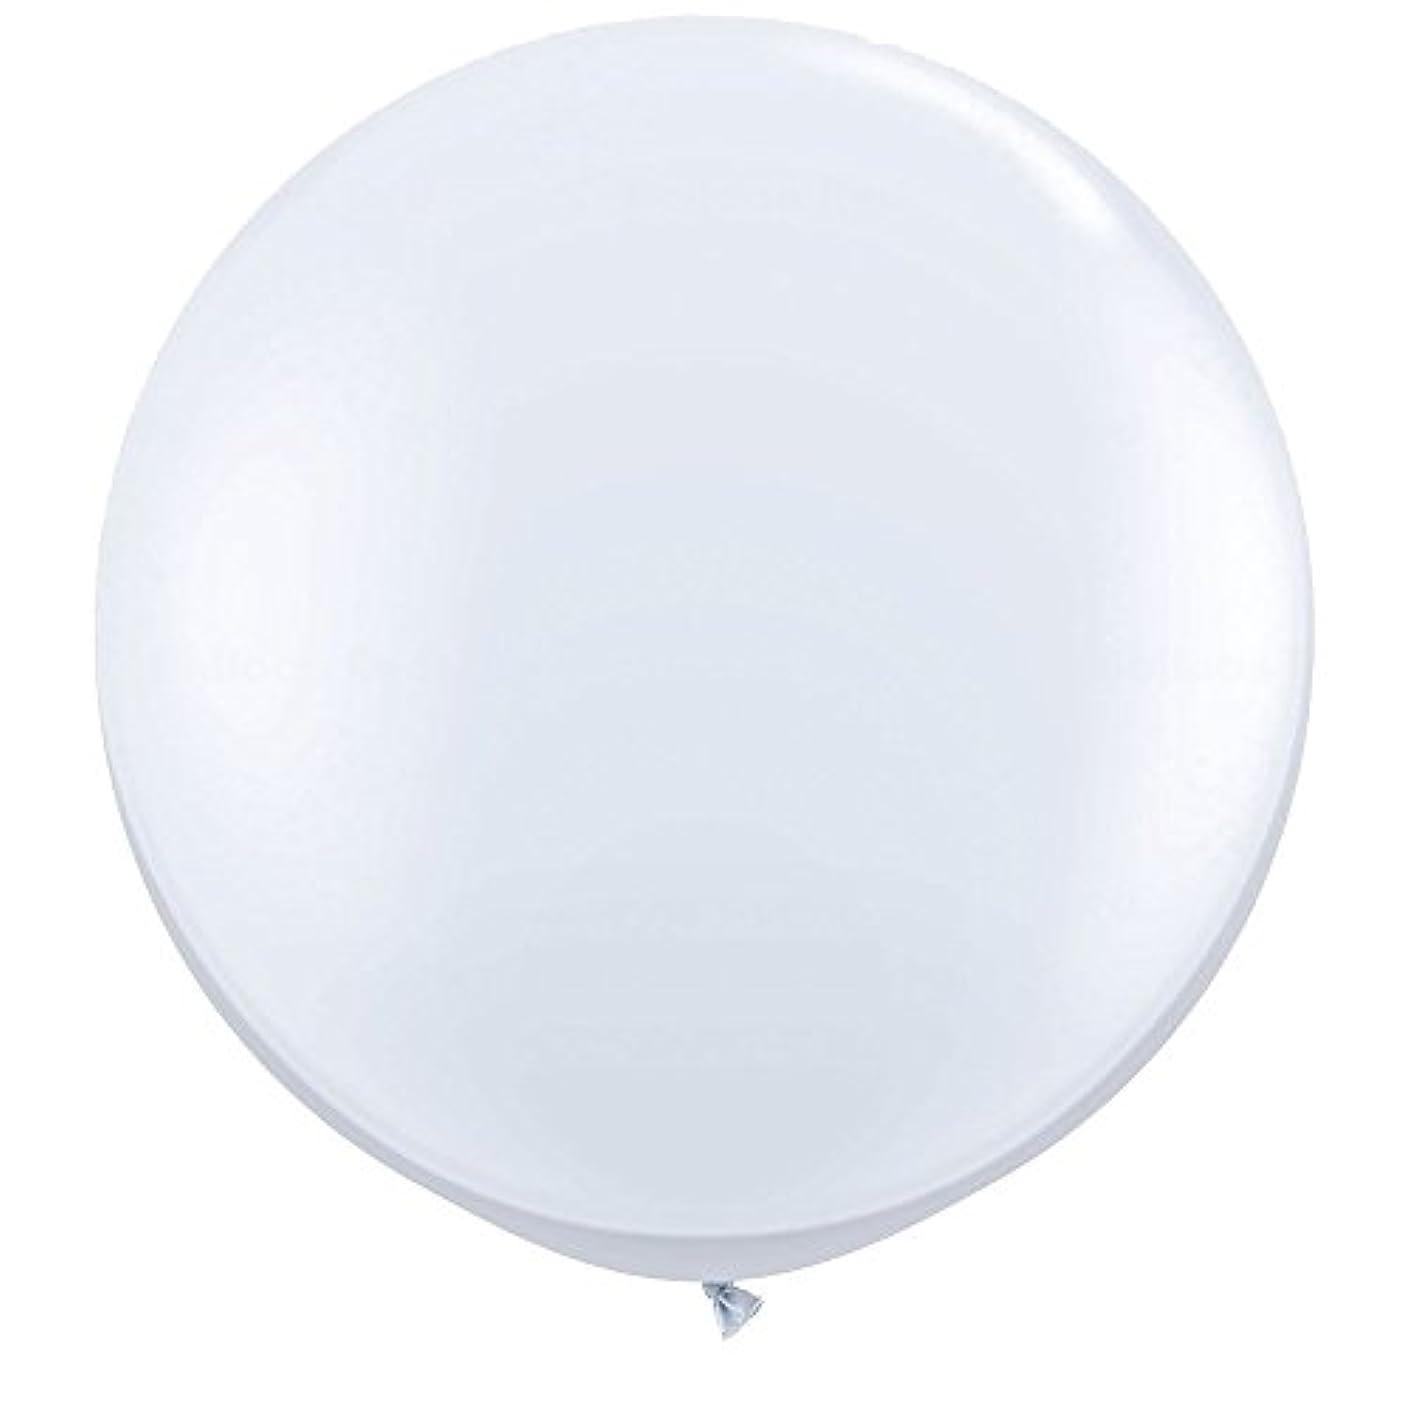 NYKKOLA 36 Inch Giant Latex Balloon (Premium Helium Quality),6 Pack Big White Balloons